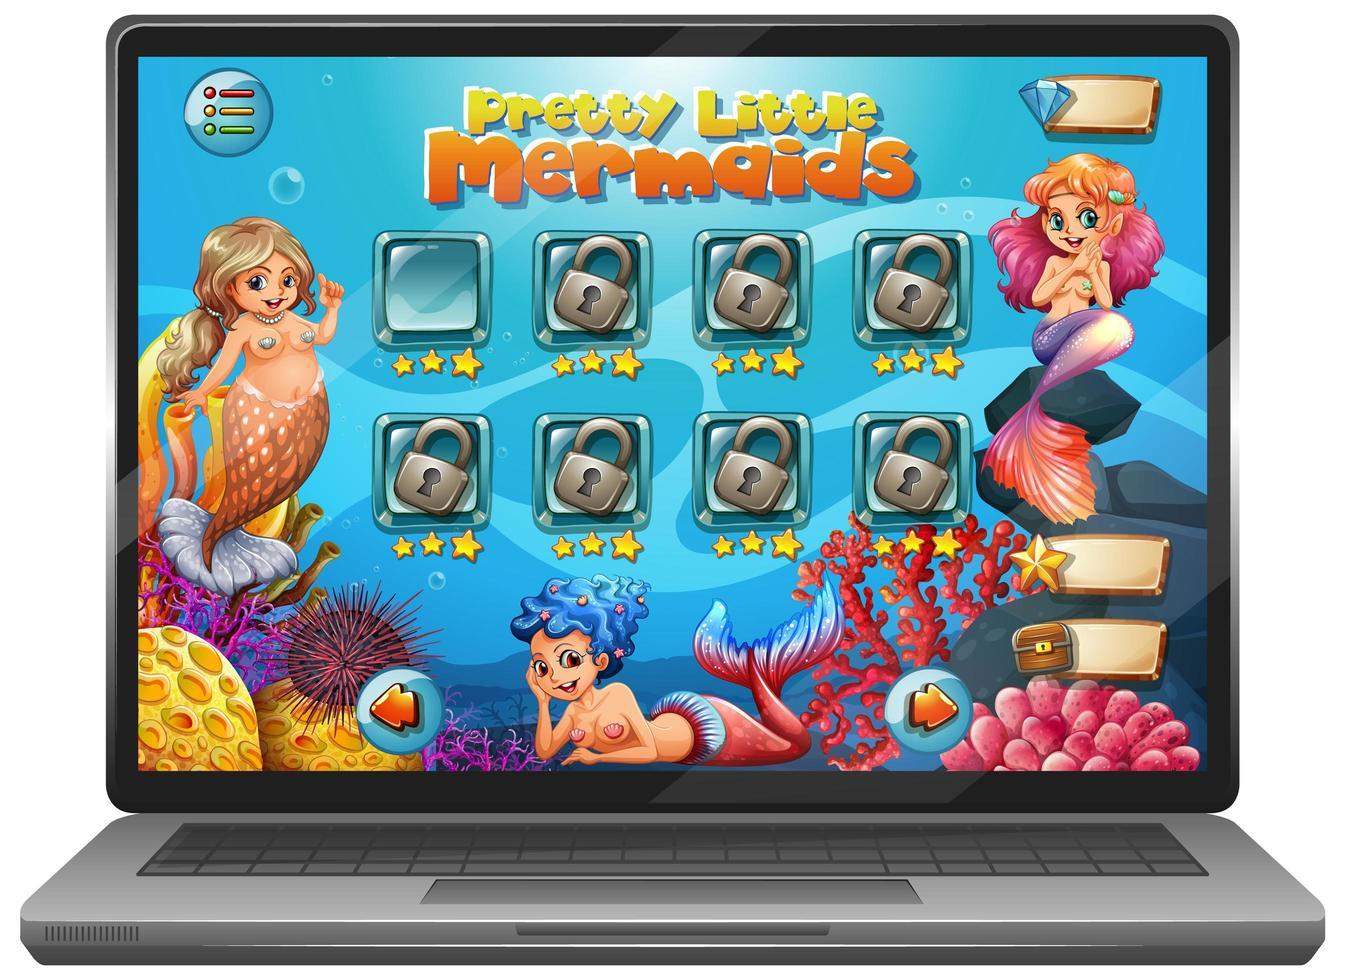 Meerjungfrau Spiel auf Laptop-Bildschirm vektor